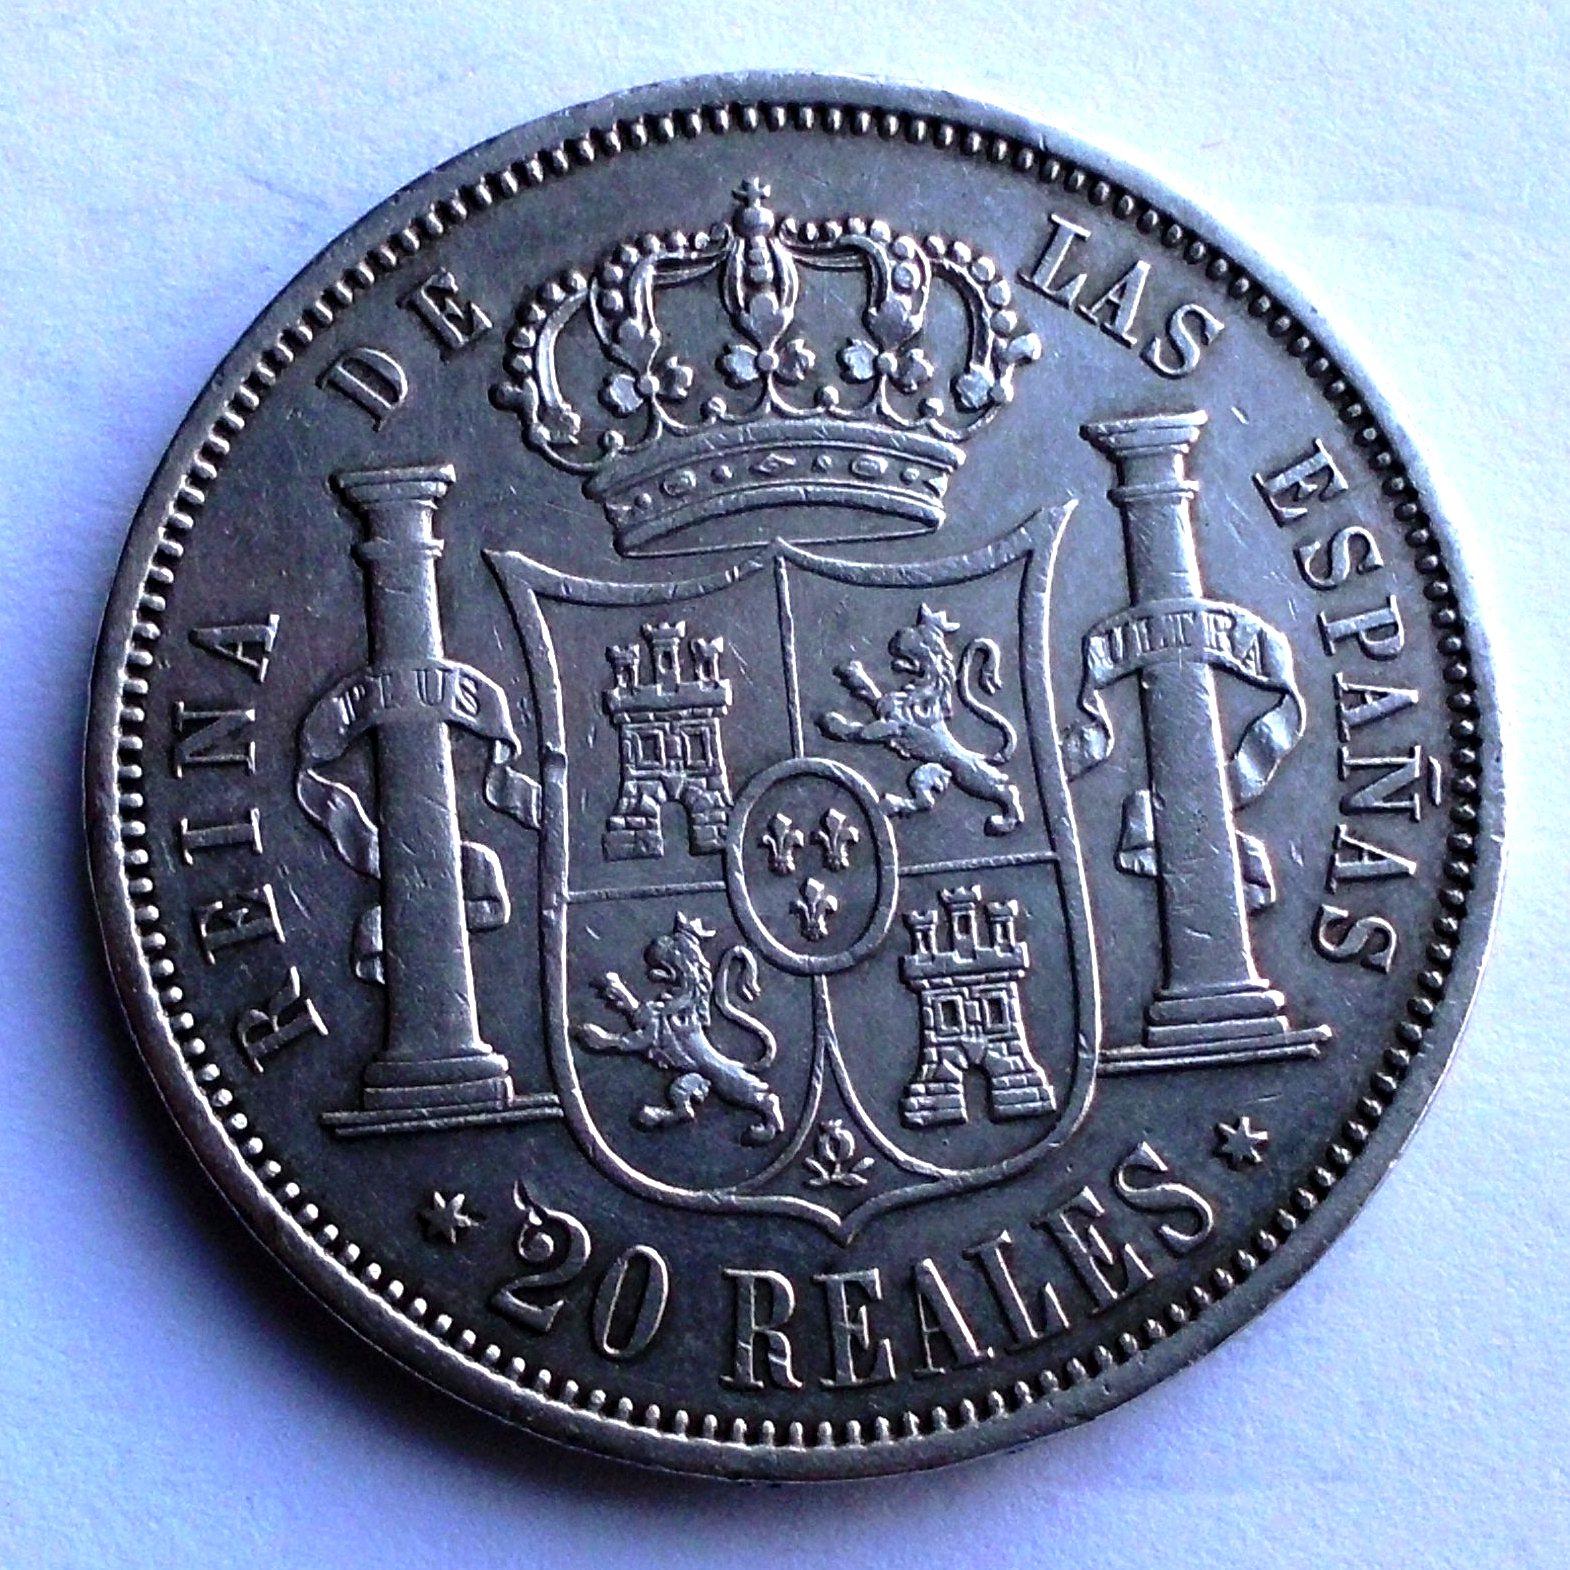 20 reales 1864 isabel II madrid B7jcl0